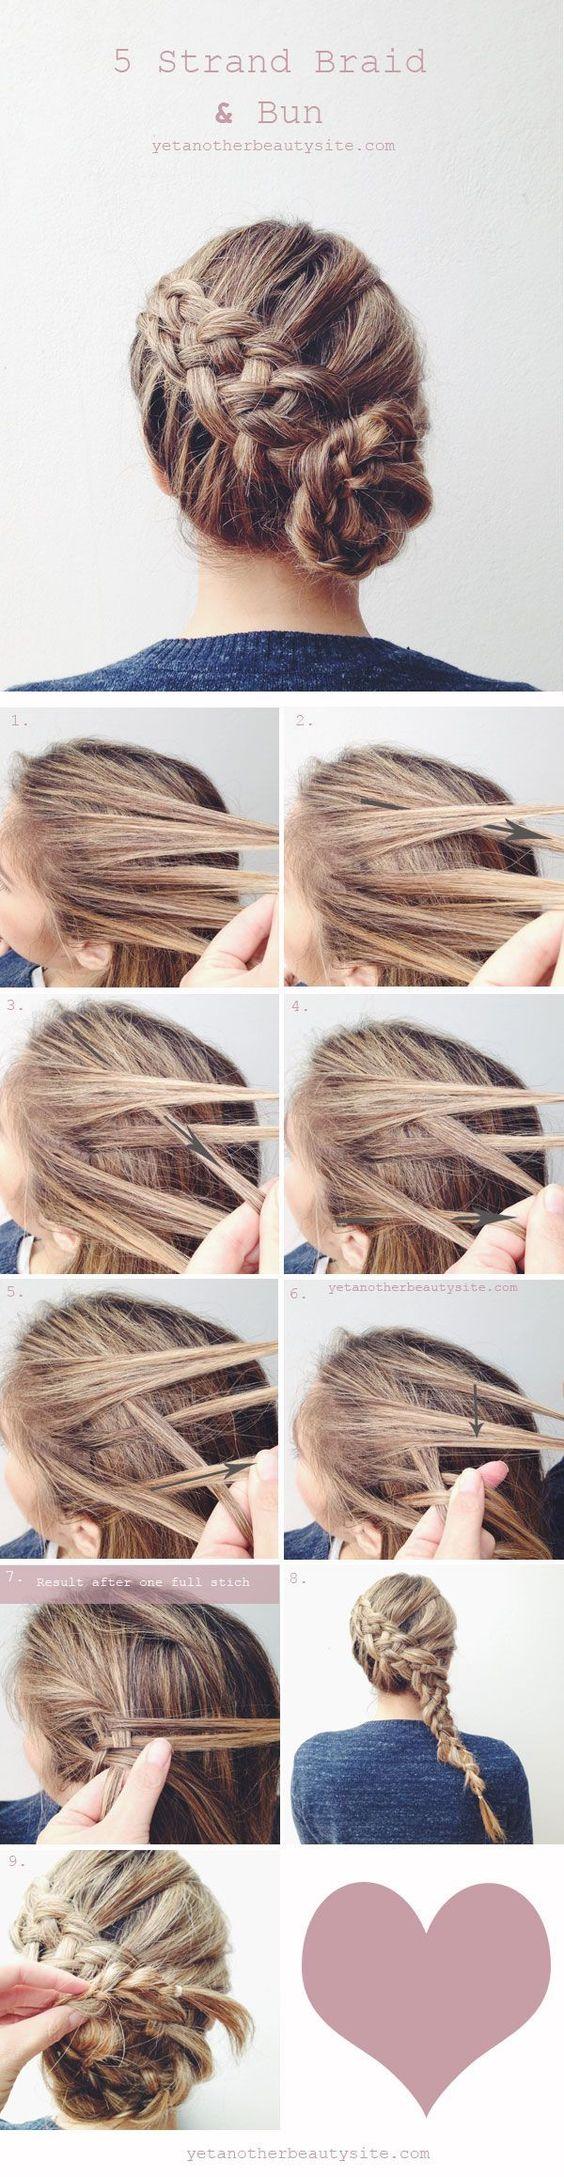 diy 5 strand braid and bun wedding hairstyles: